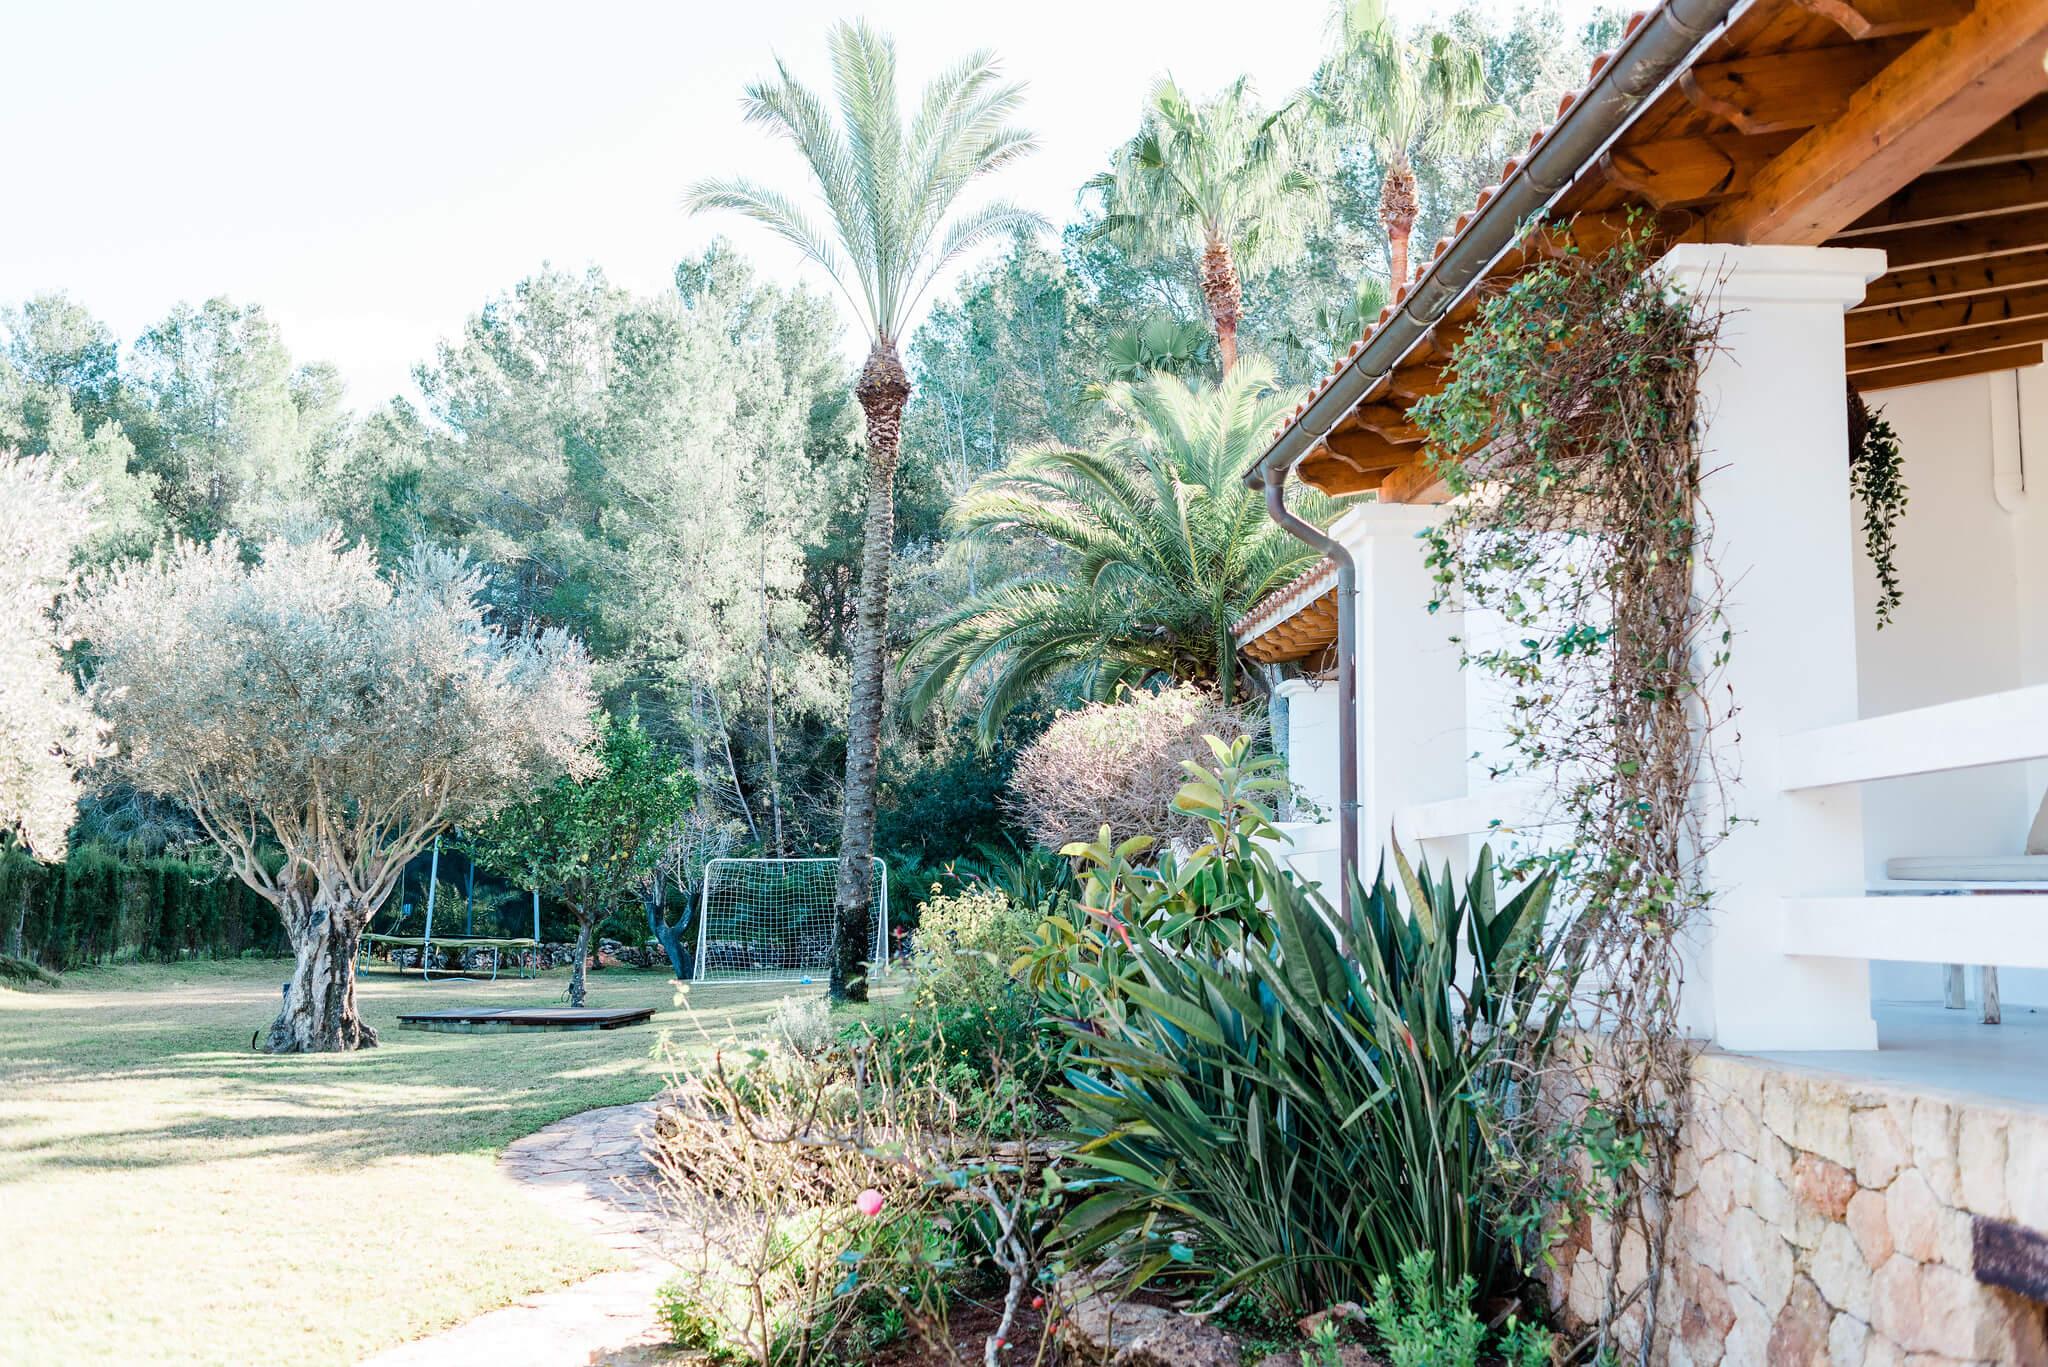 https://www.white-ibiza.com/wp-content/uploads/2020/05/white-ibiza-villas-can-verde-exterior-side-of-house.jpg